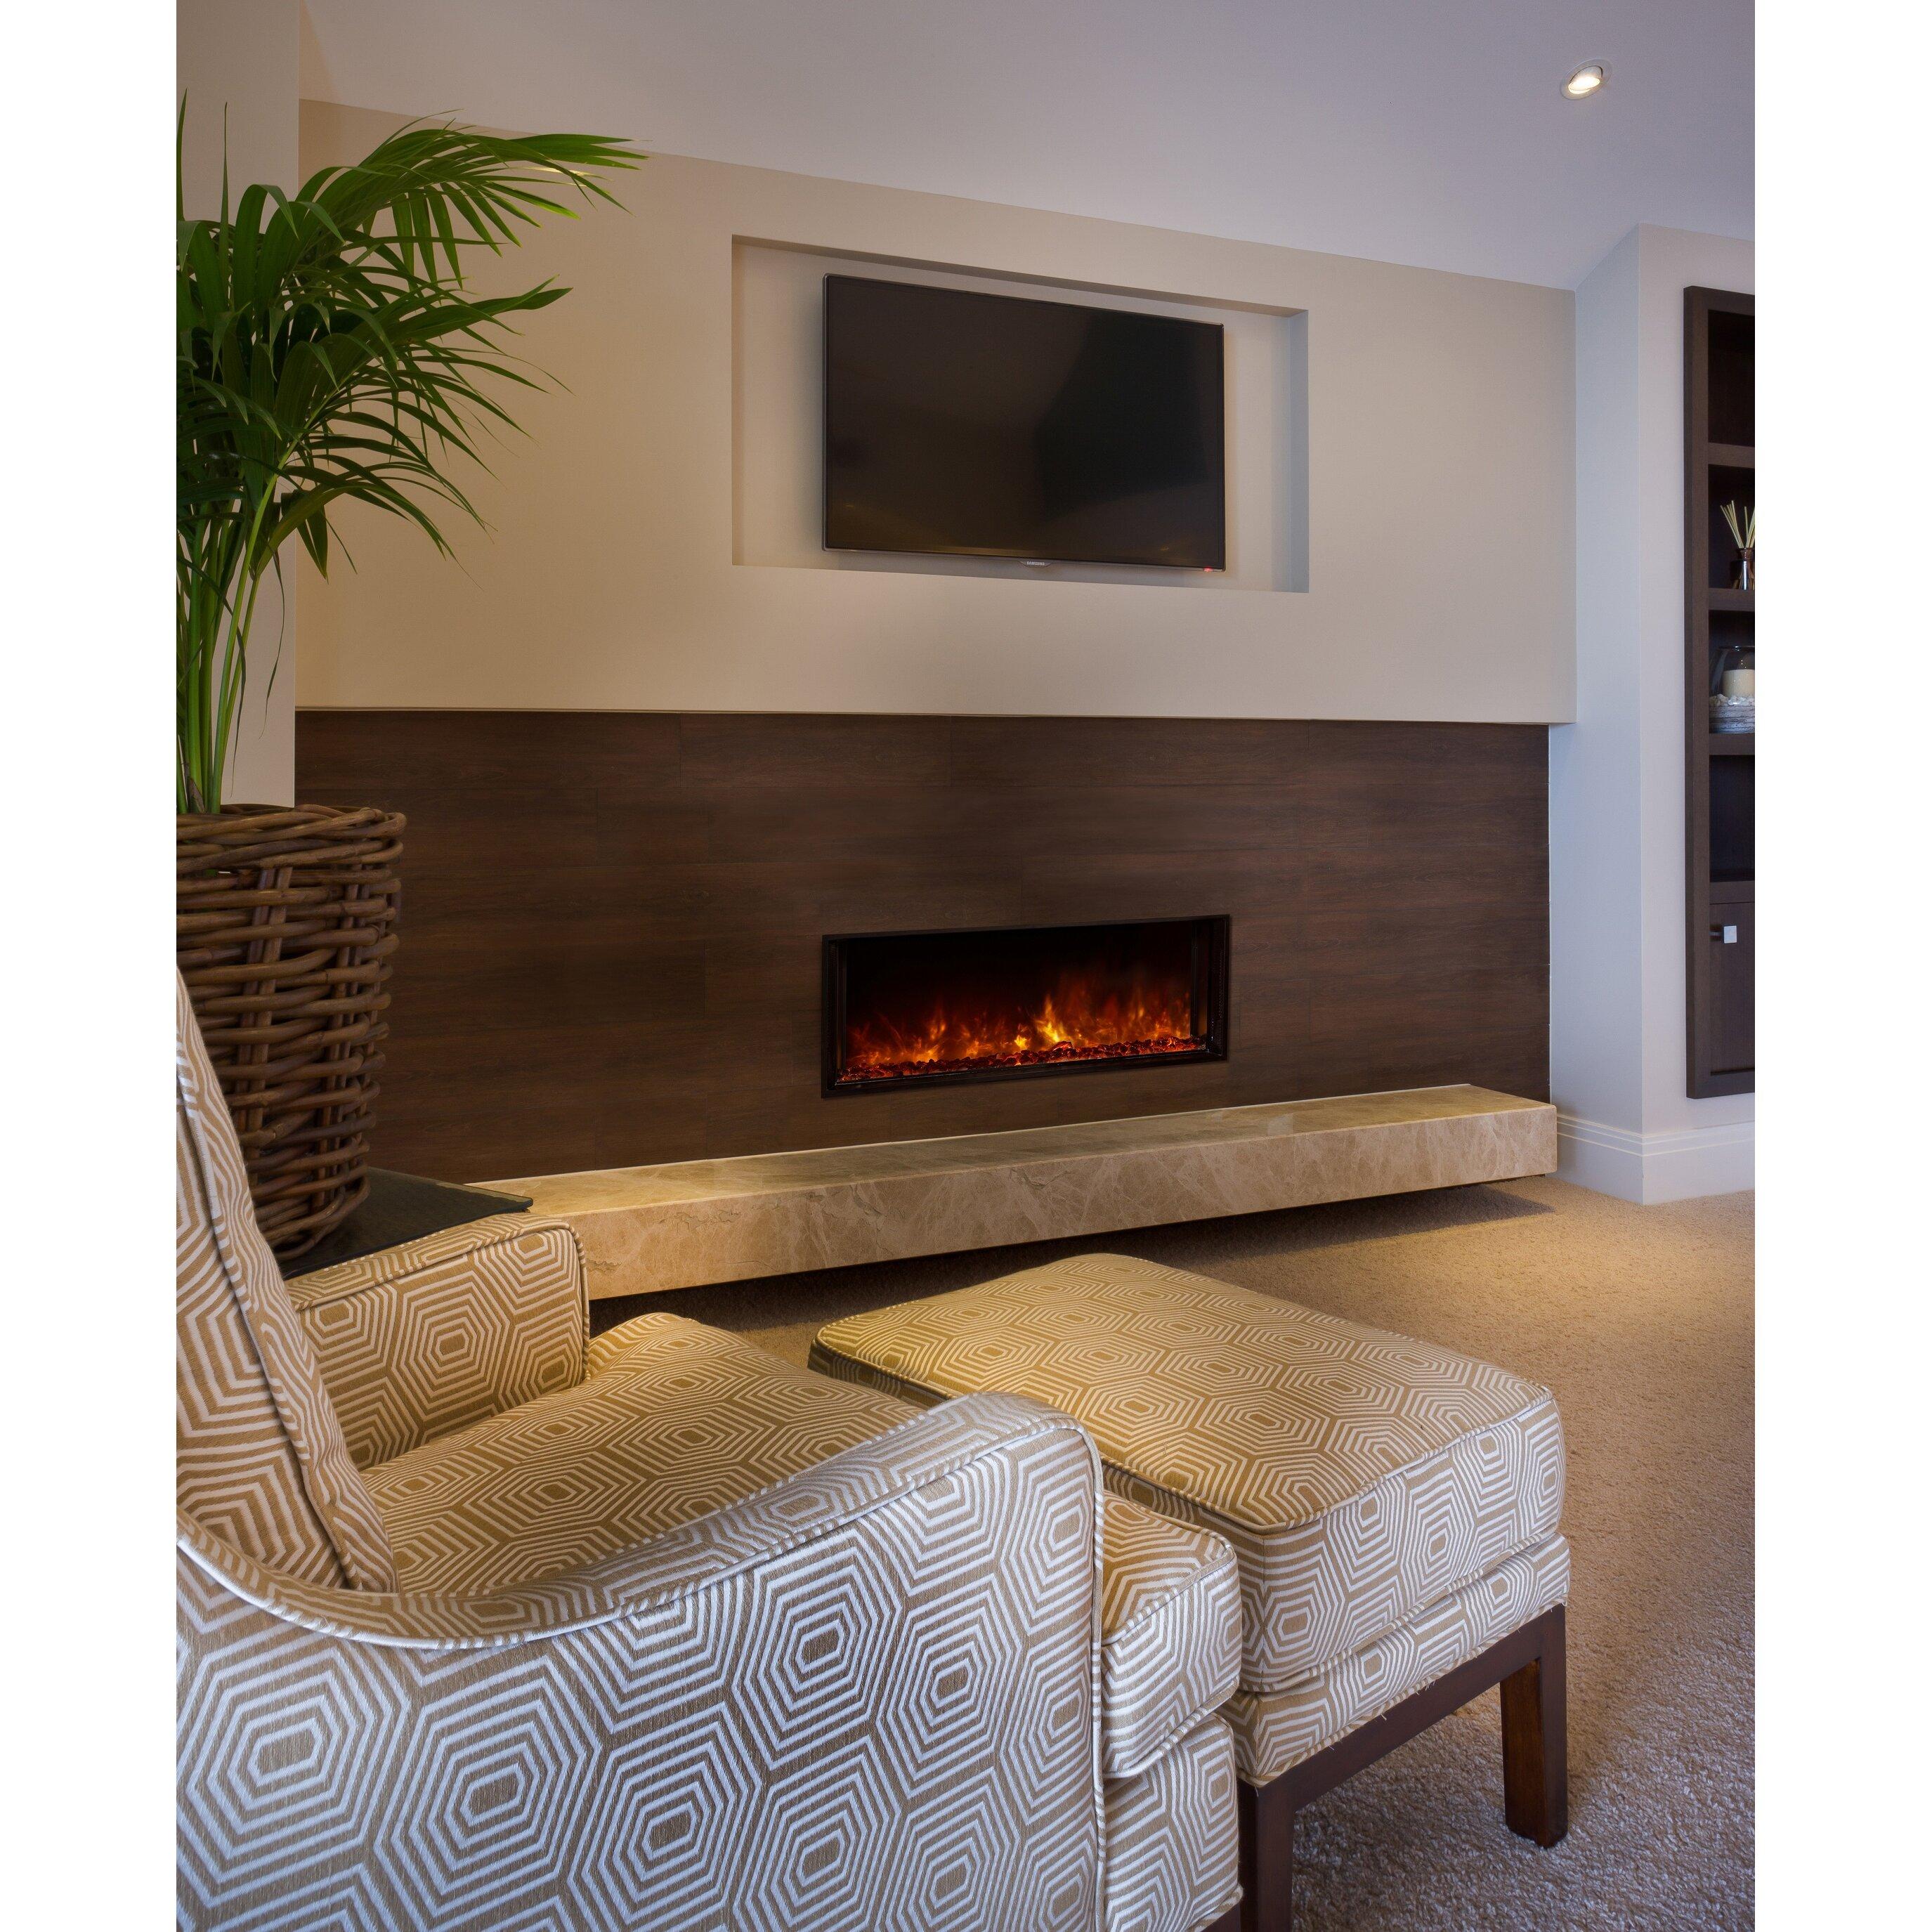 Modern flames landscape fullview series wall mount electric fireplace reviews wayfair - Contemporary wall mount fireplace ...